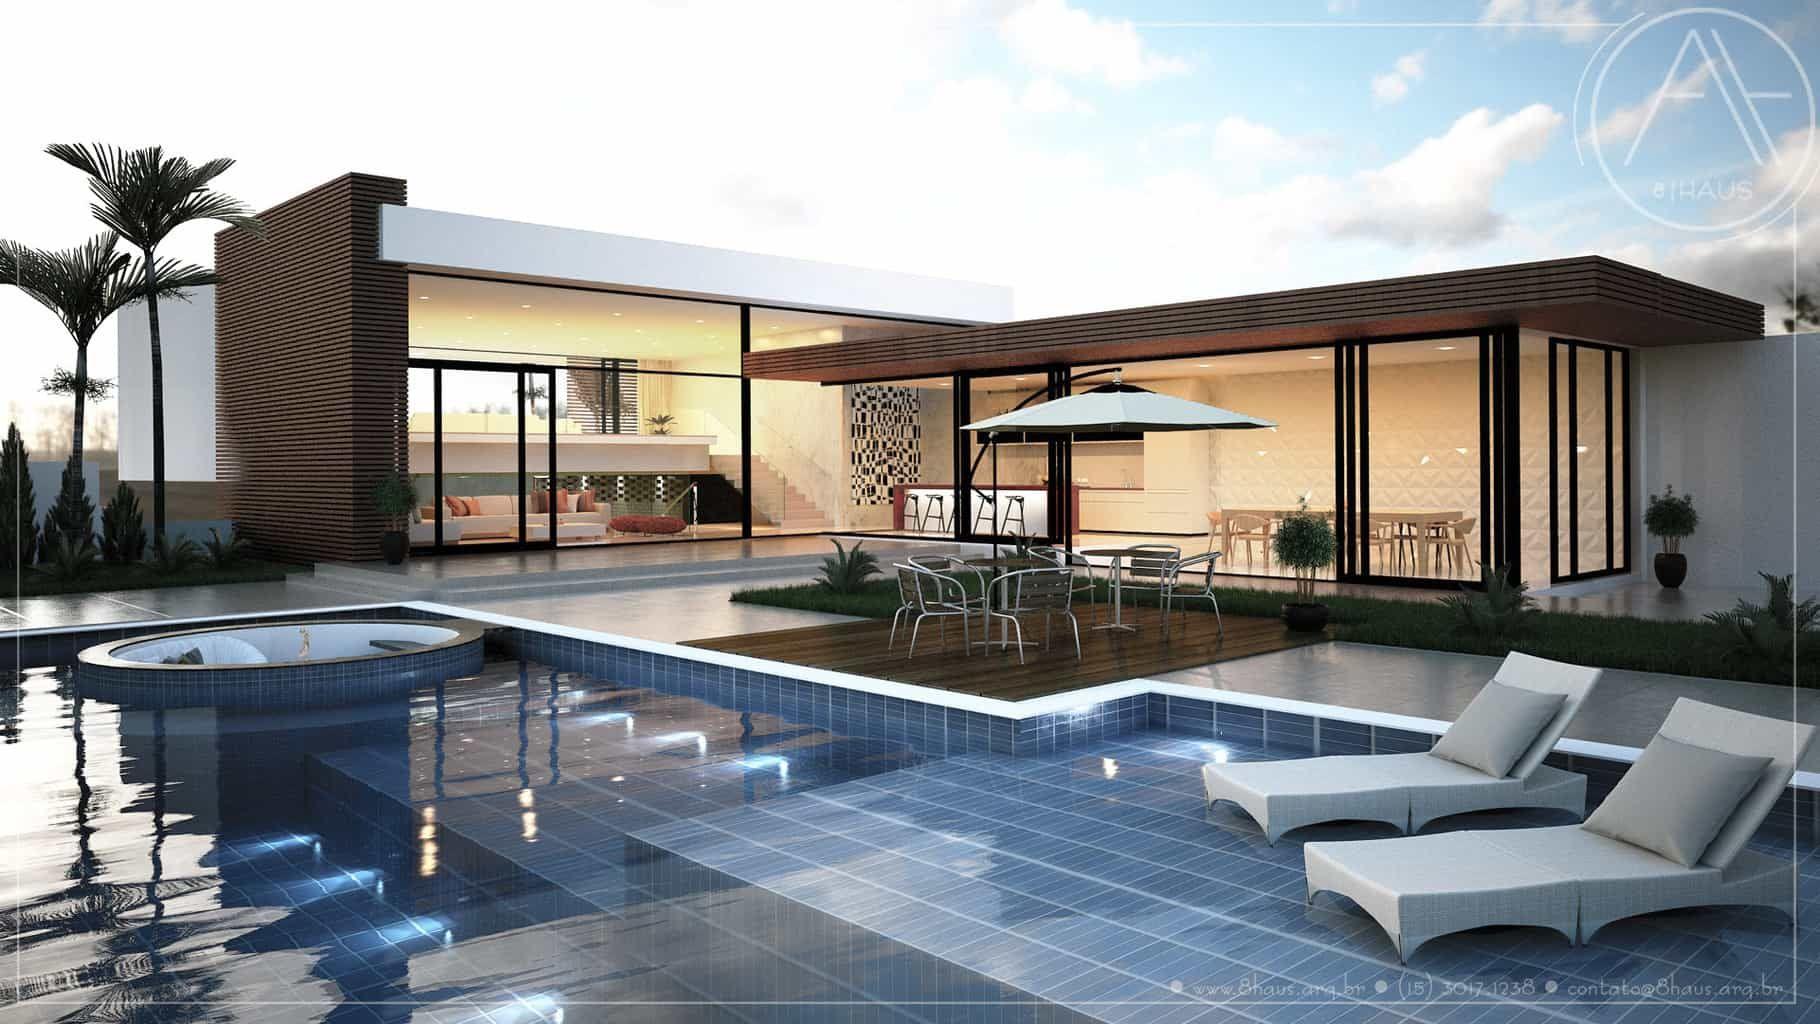 Pin by 8 haus arquitetura on projetos 8 haus arquitetura for Casas modernas con piscina interior